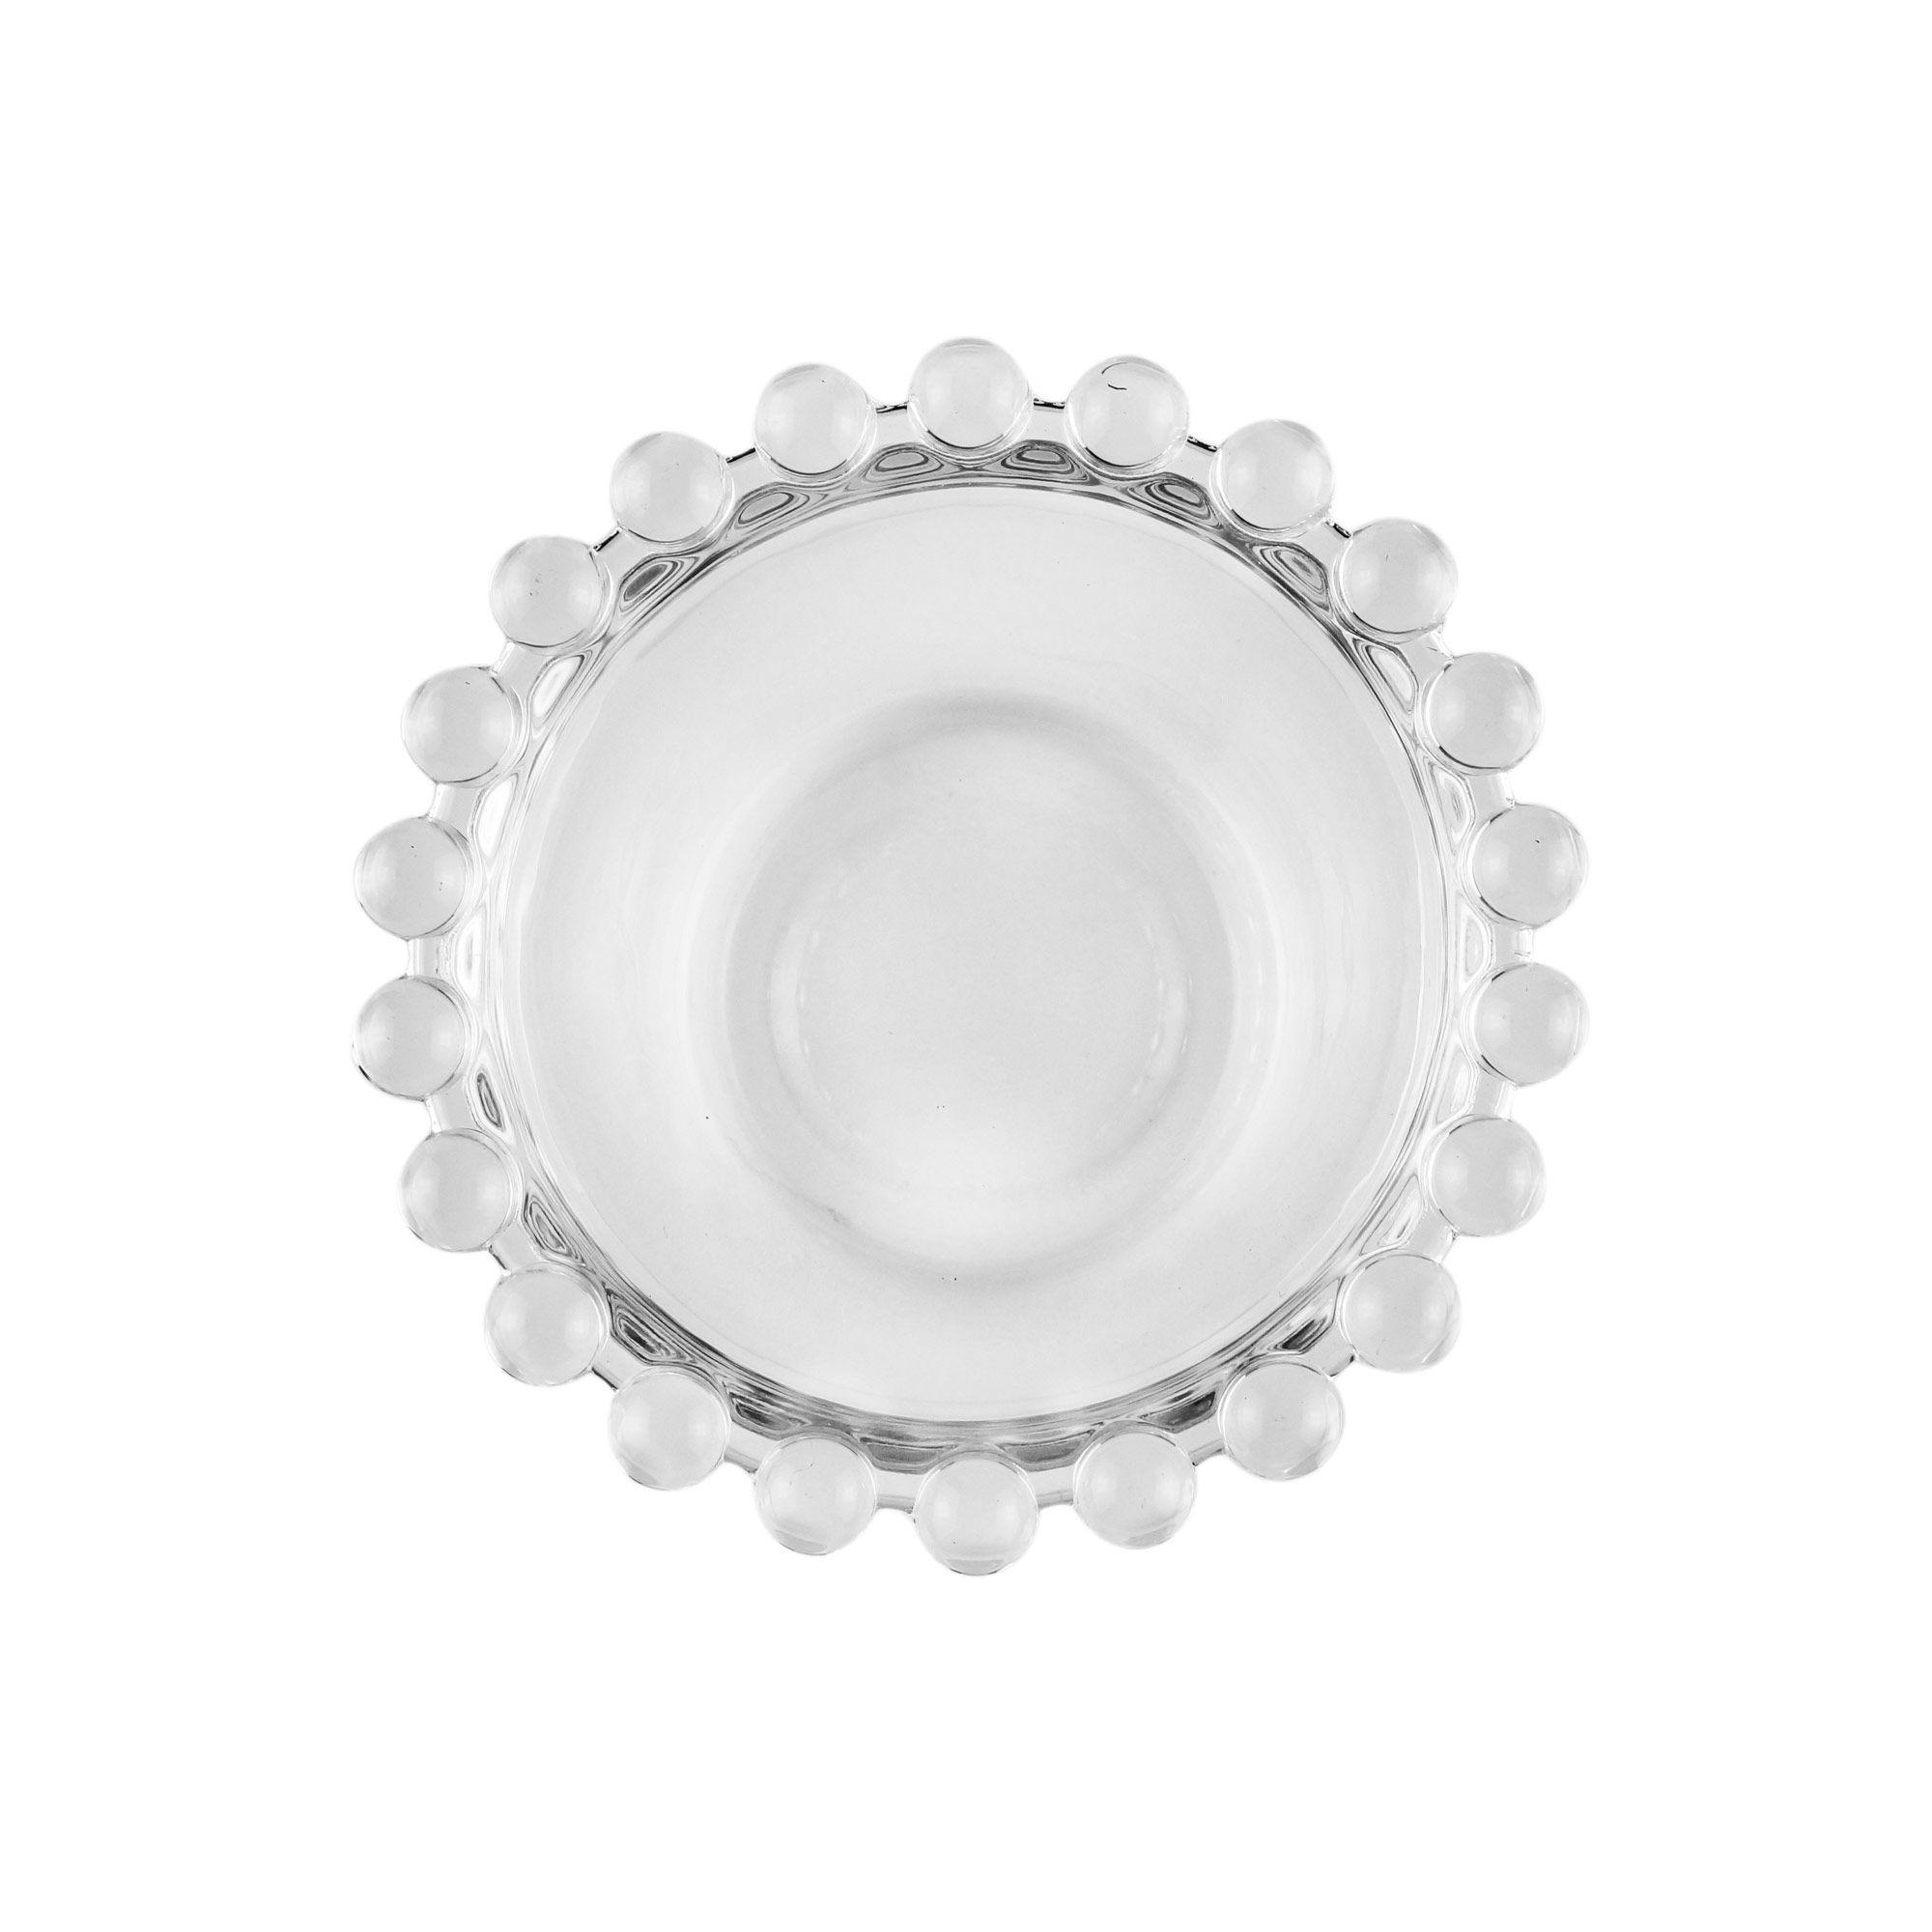 Jogo 4 bowls 9 cm para sobremesa de cristal transparente Pearl Wolff - 27896